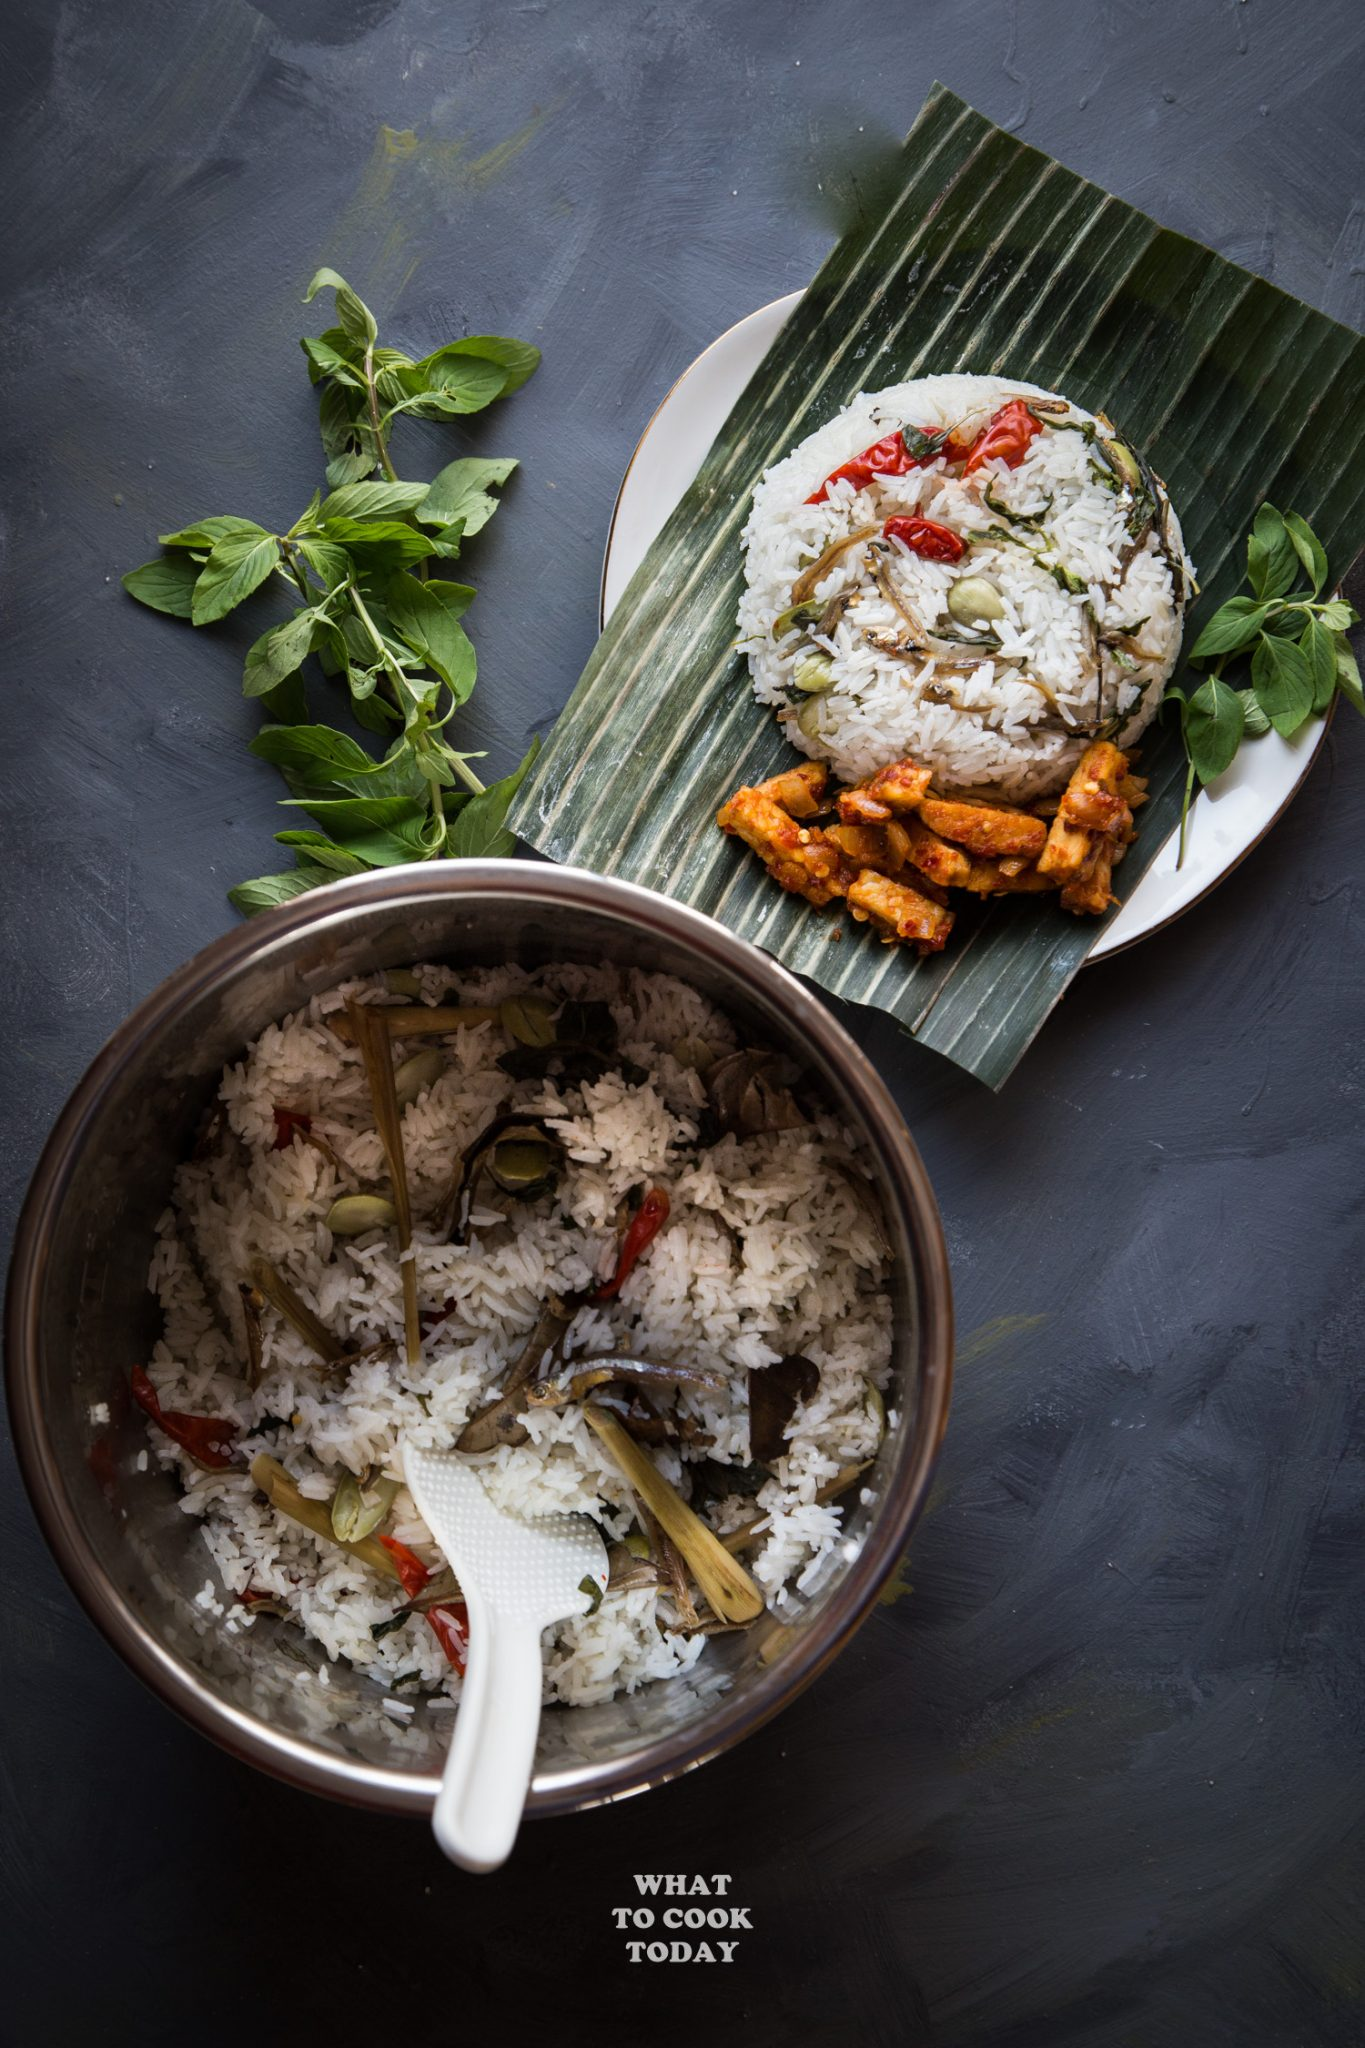 Nasi Liwet Magicom : liwet, magicom, Liwet, Sunda, Indonesian, Aromatic, Spiced, Coconut, Rice), Today